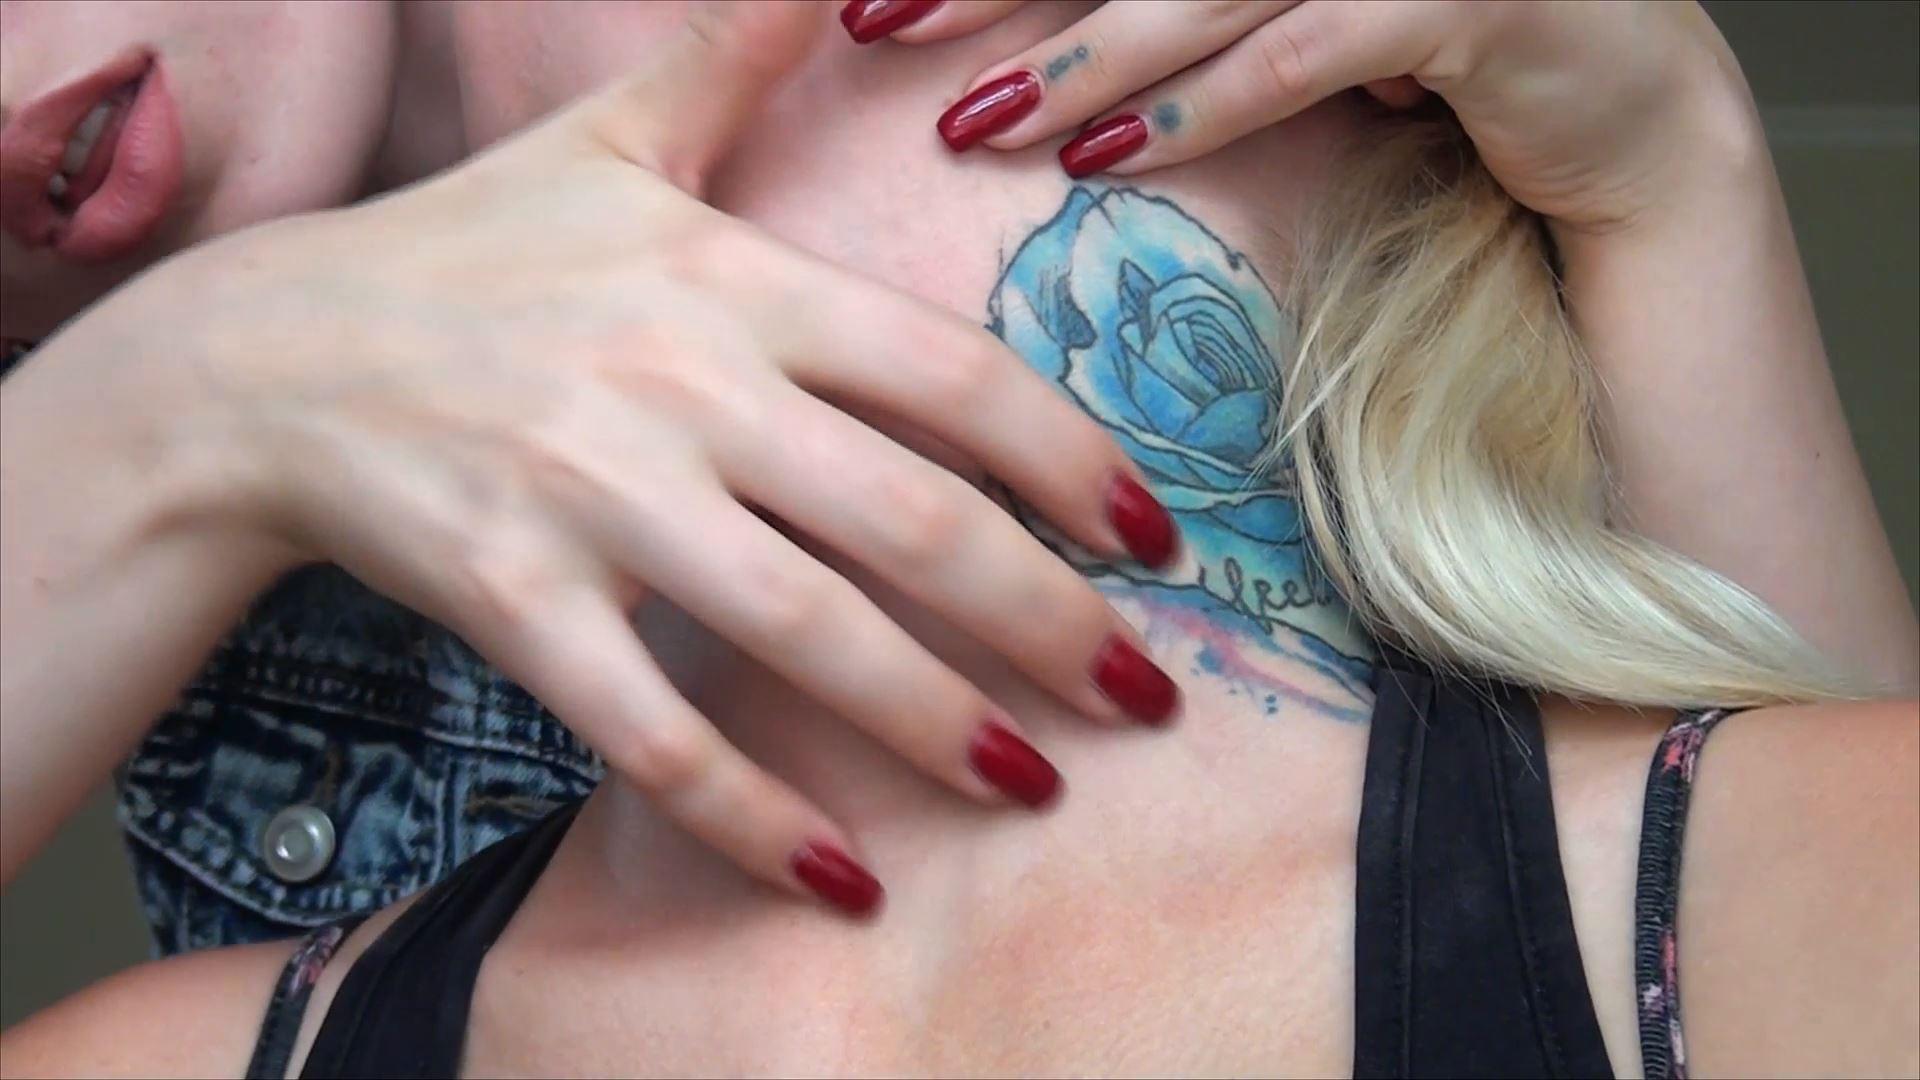 Massage neck and Adam's Apple - FEMALES THROAT FETISH - FULL HD/1080p/MP4